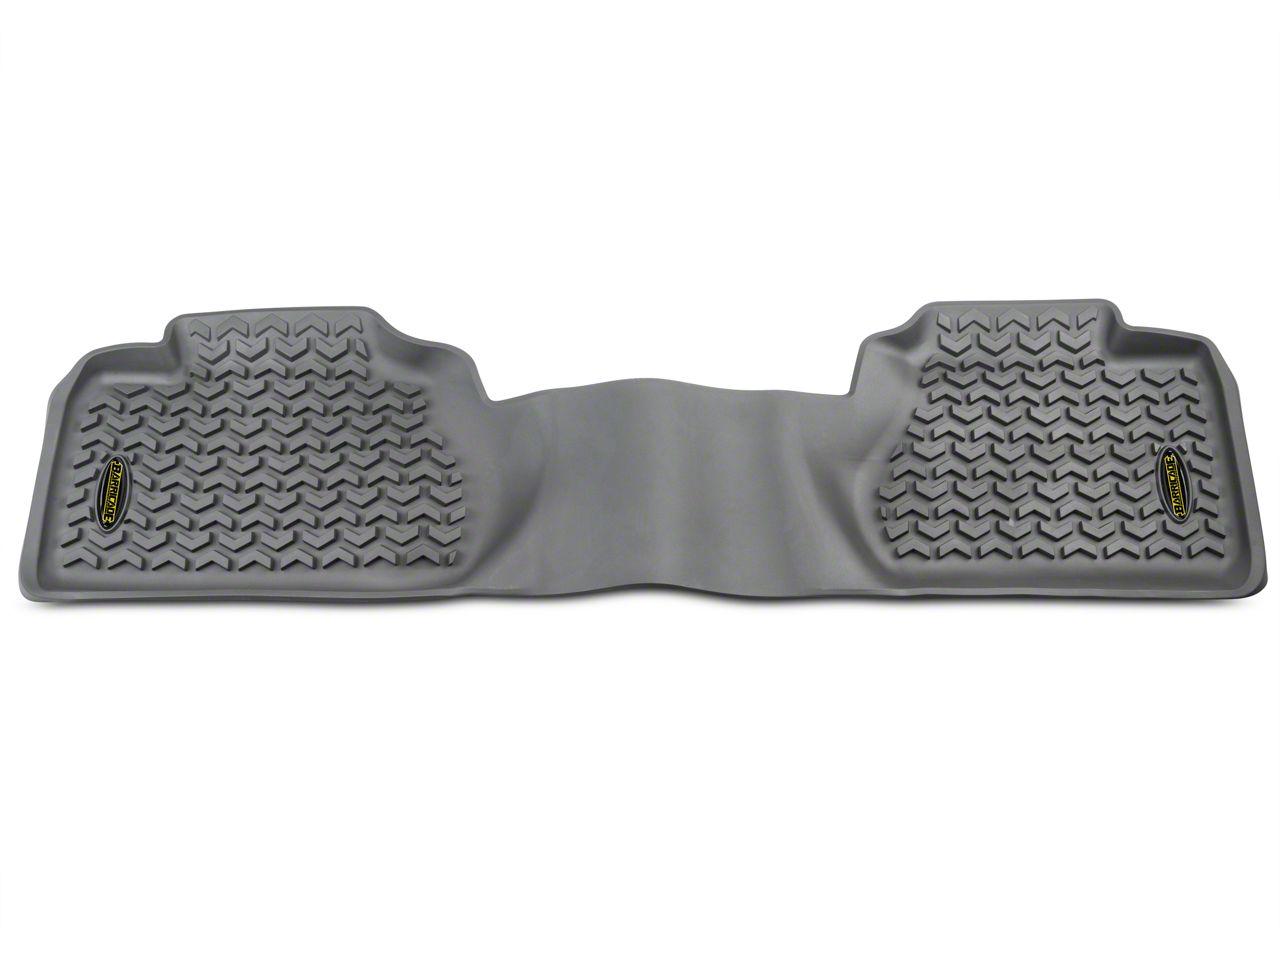 Barricade Rear Floor Mat - Gray (07-13 Sierra 1500 Extended Cab)